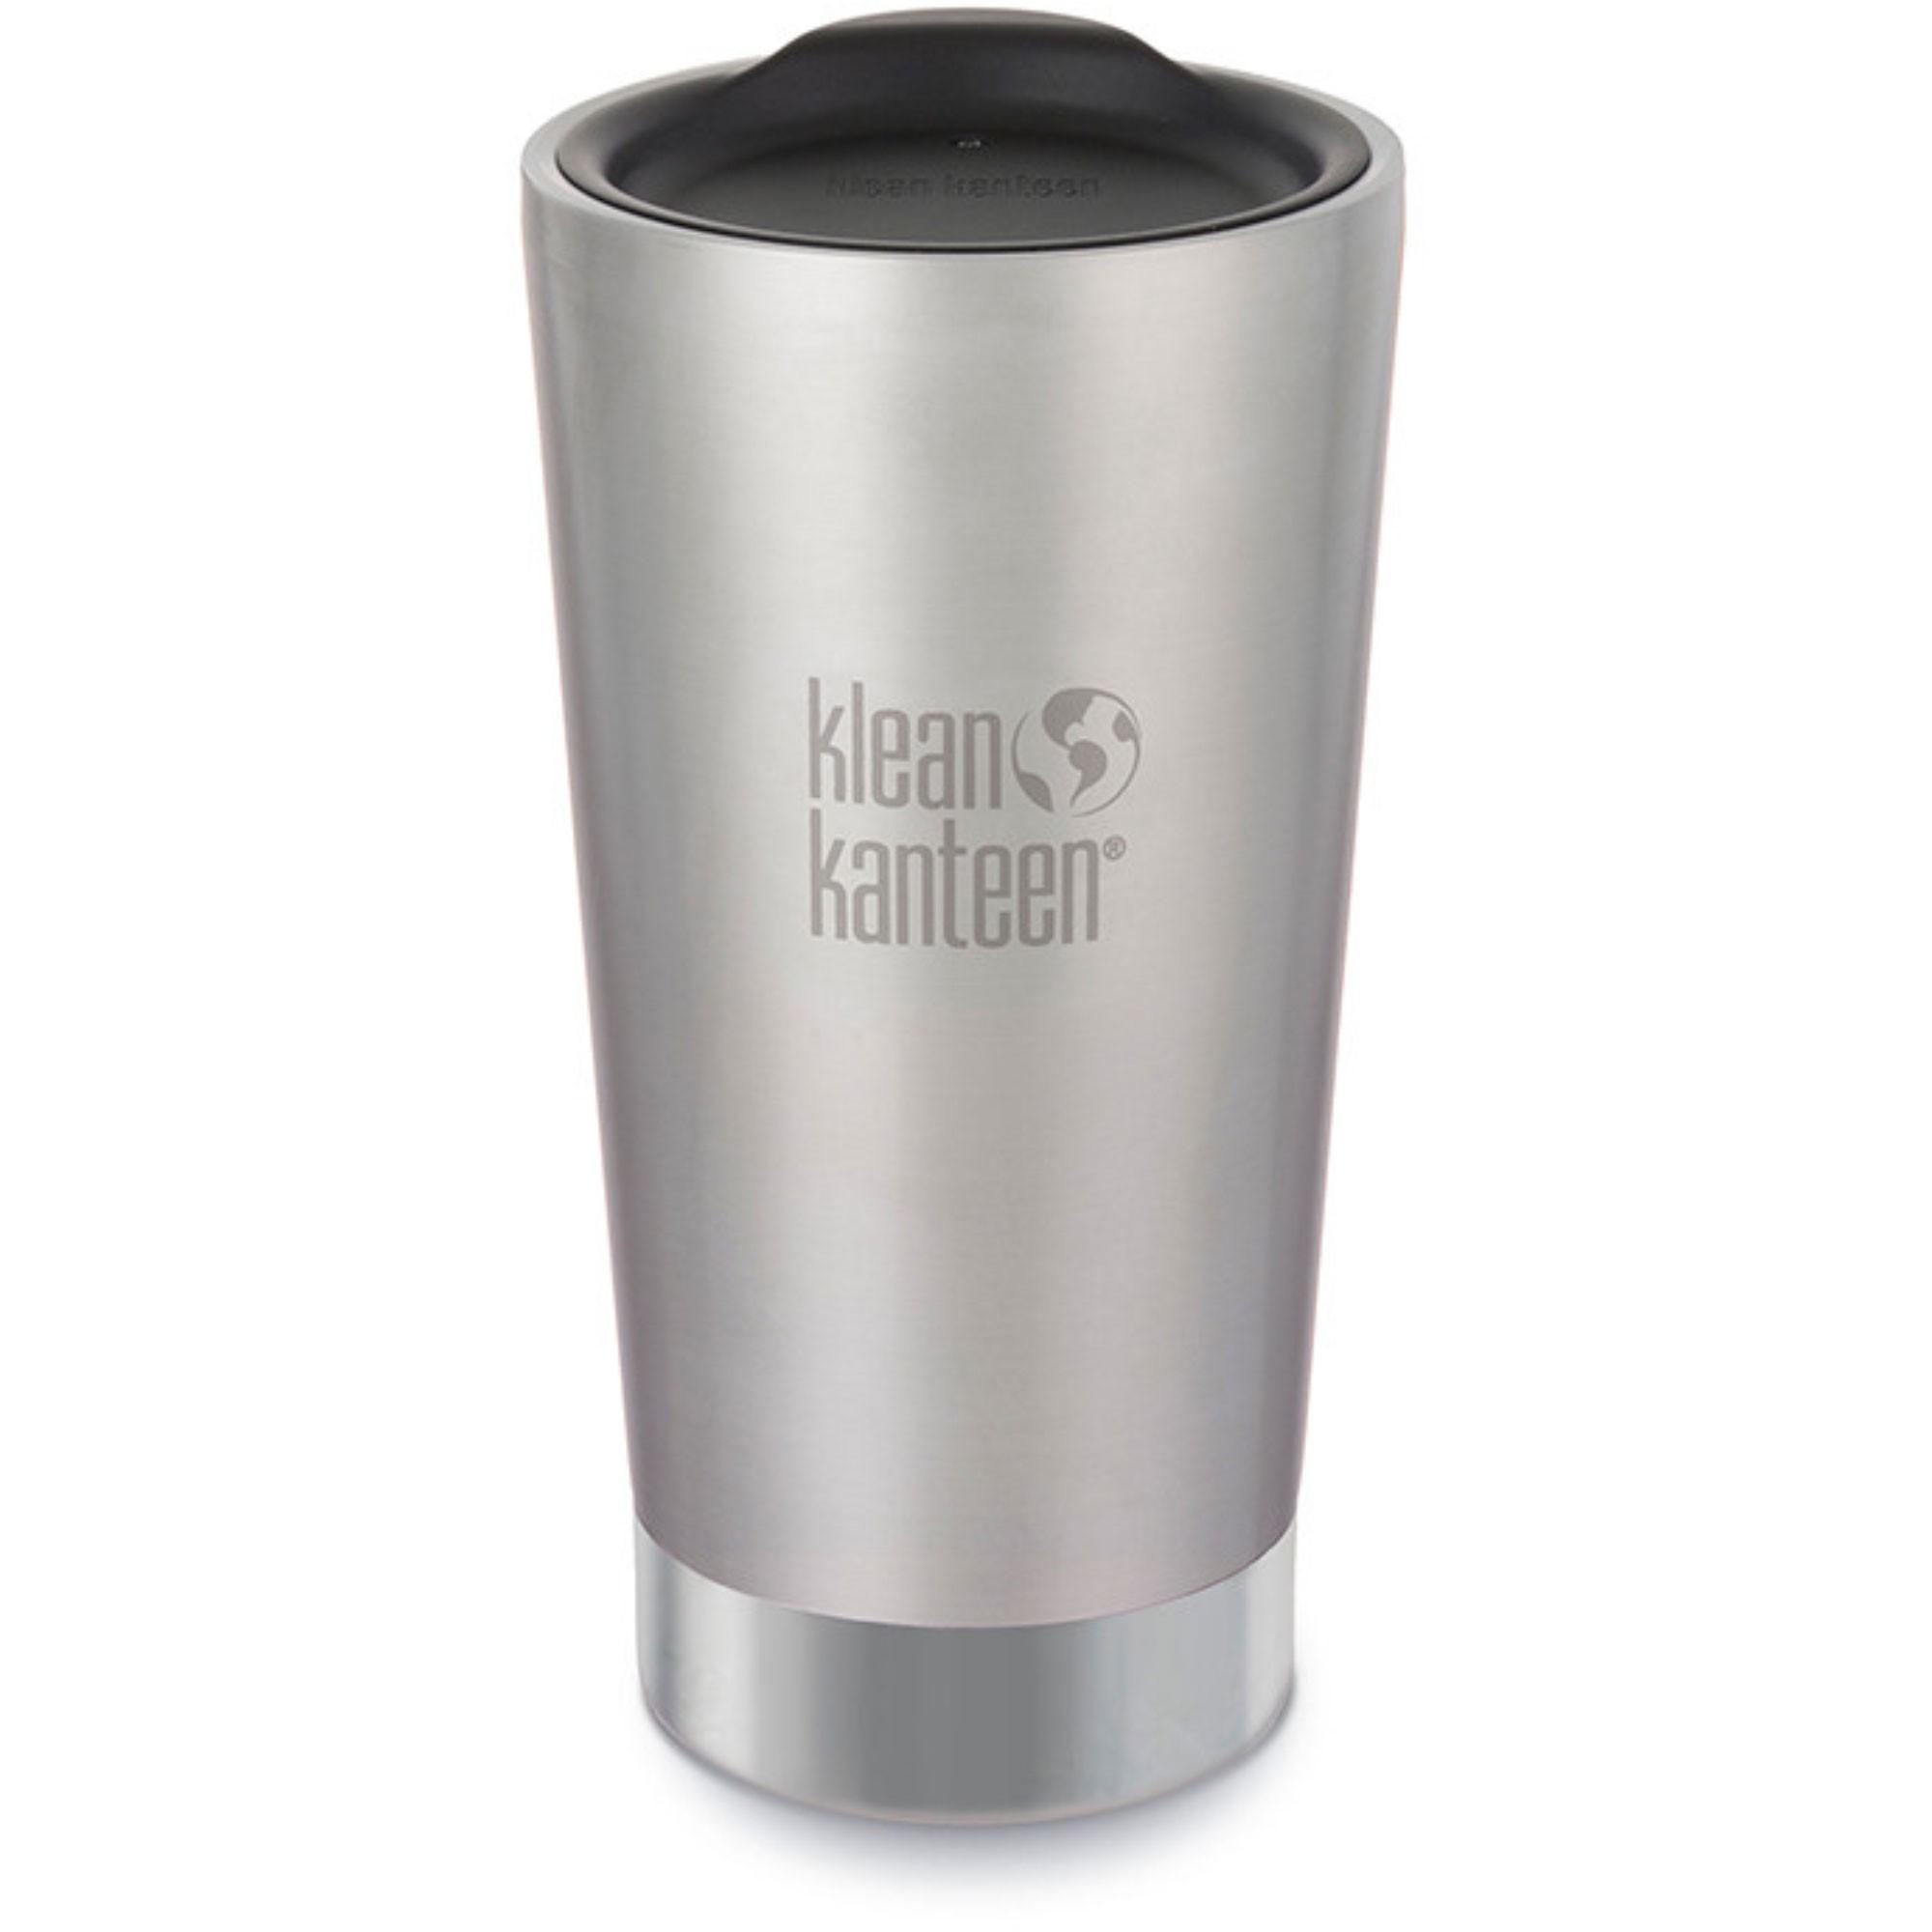 KLEAN KANTEEN - Insulated Tumbler - 473ml - Stainless Steel